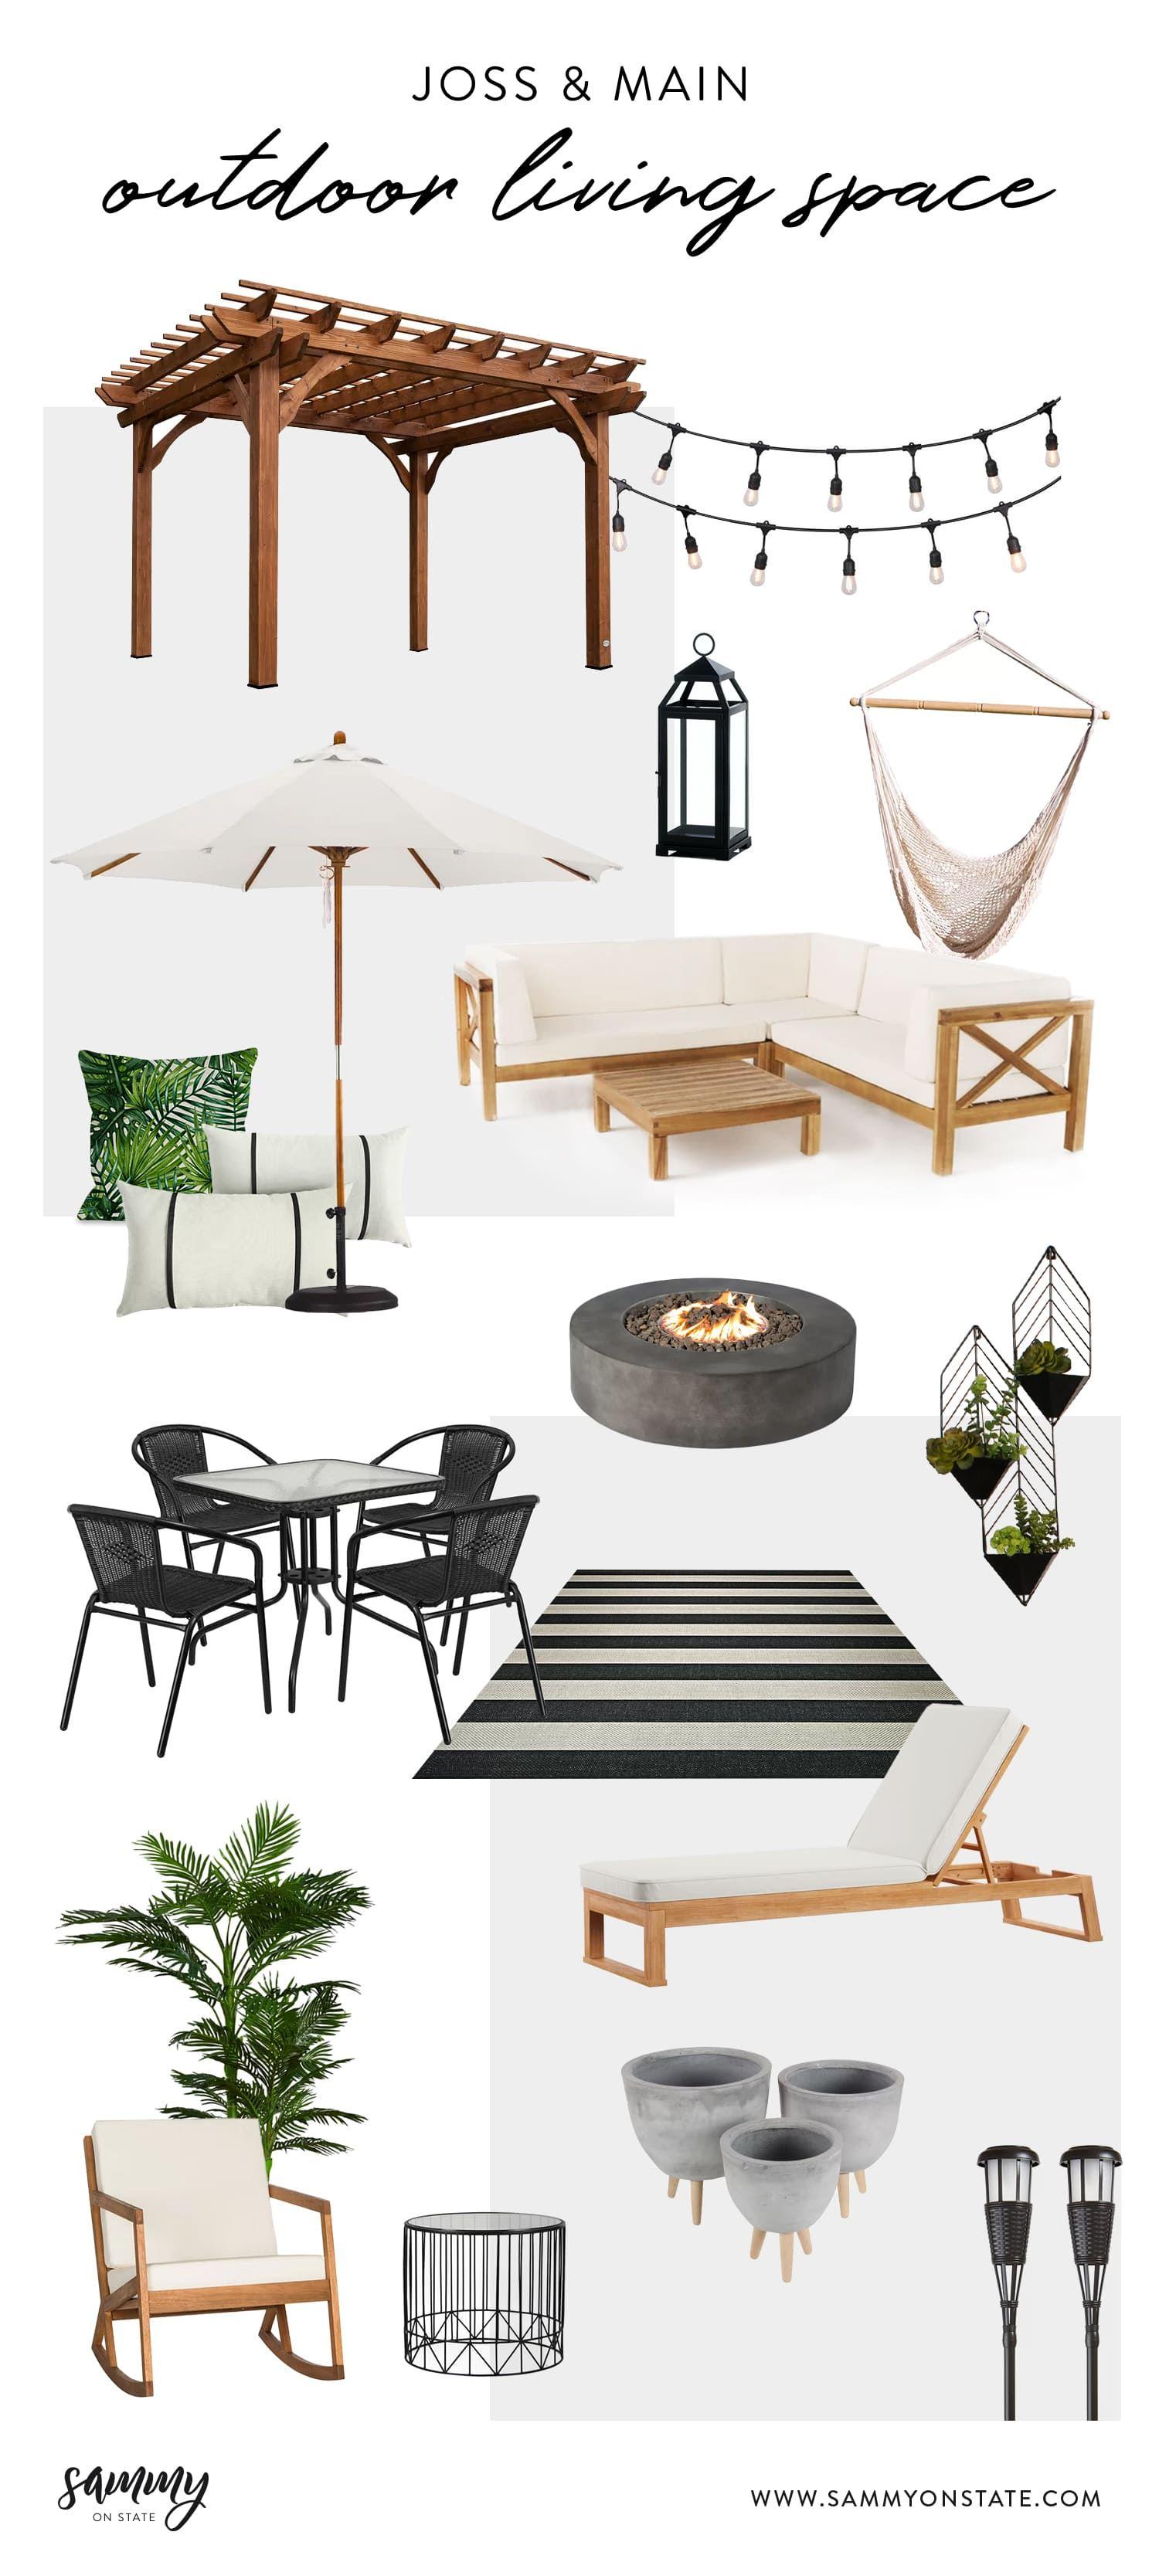 Outdoor Living Space Design Inspiration with Joss & Main #backyardoasis